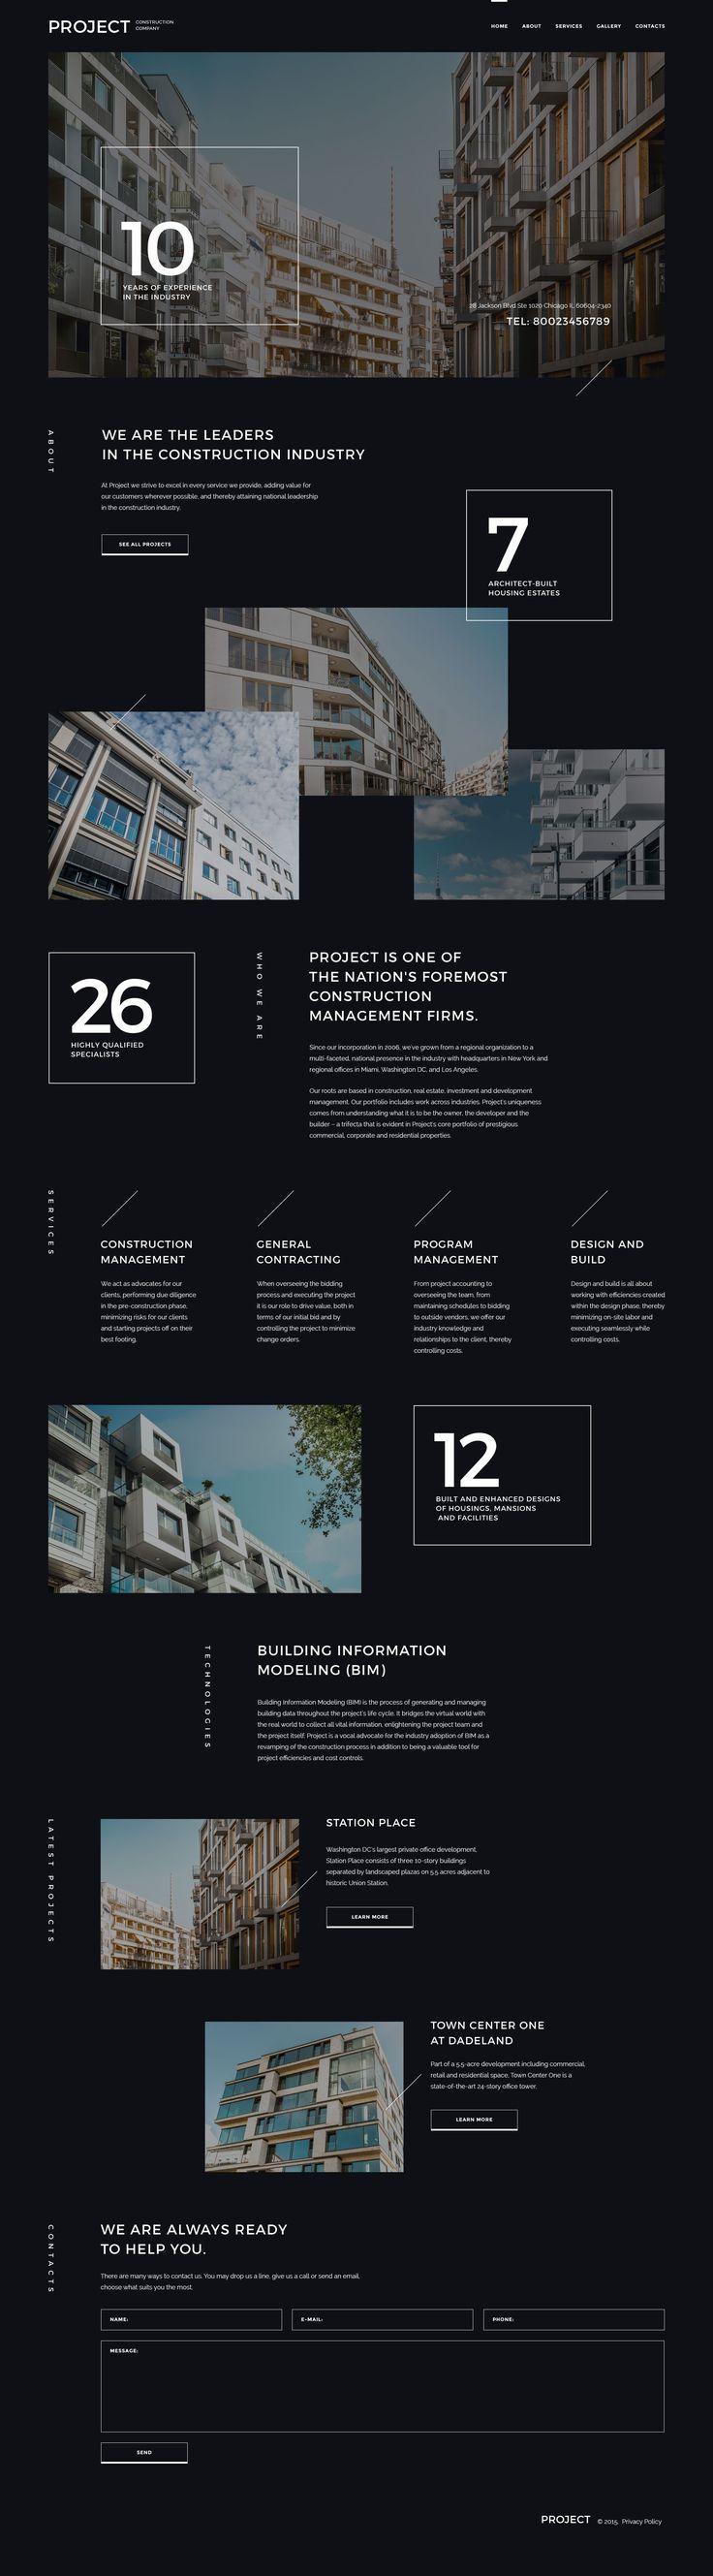 1000 ideas about construction companies on pinterest